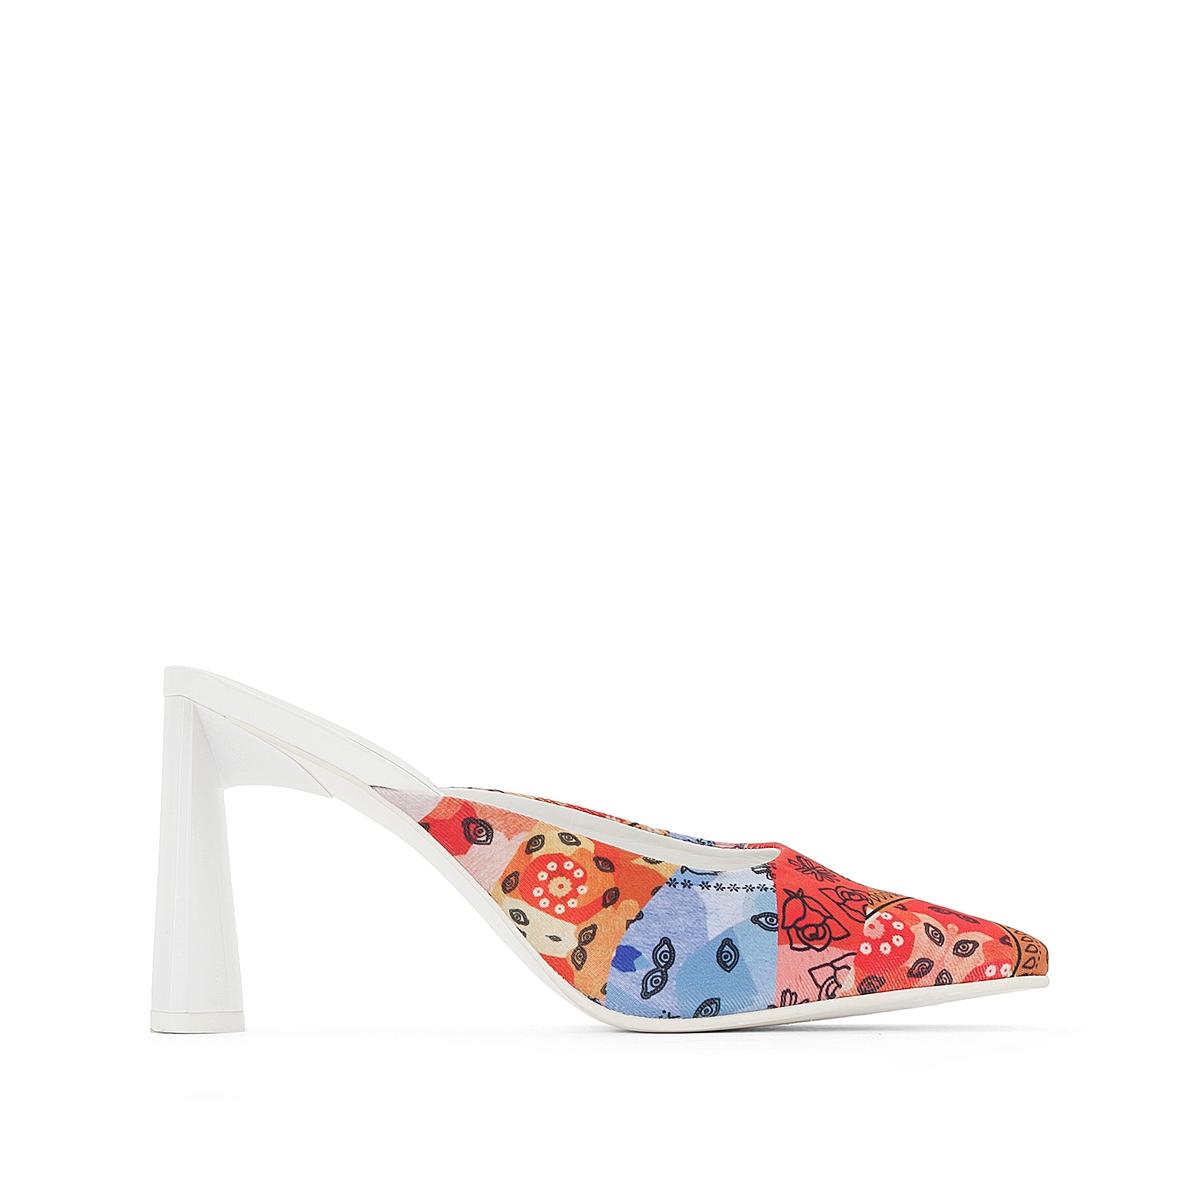 Туфли без задника тканевые от Amélie Pichard x La Redoute